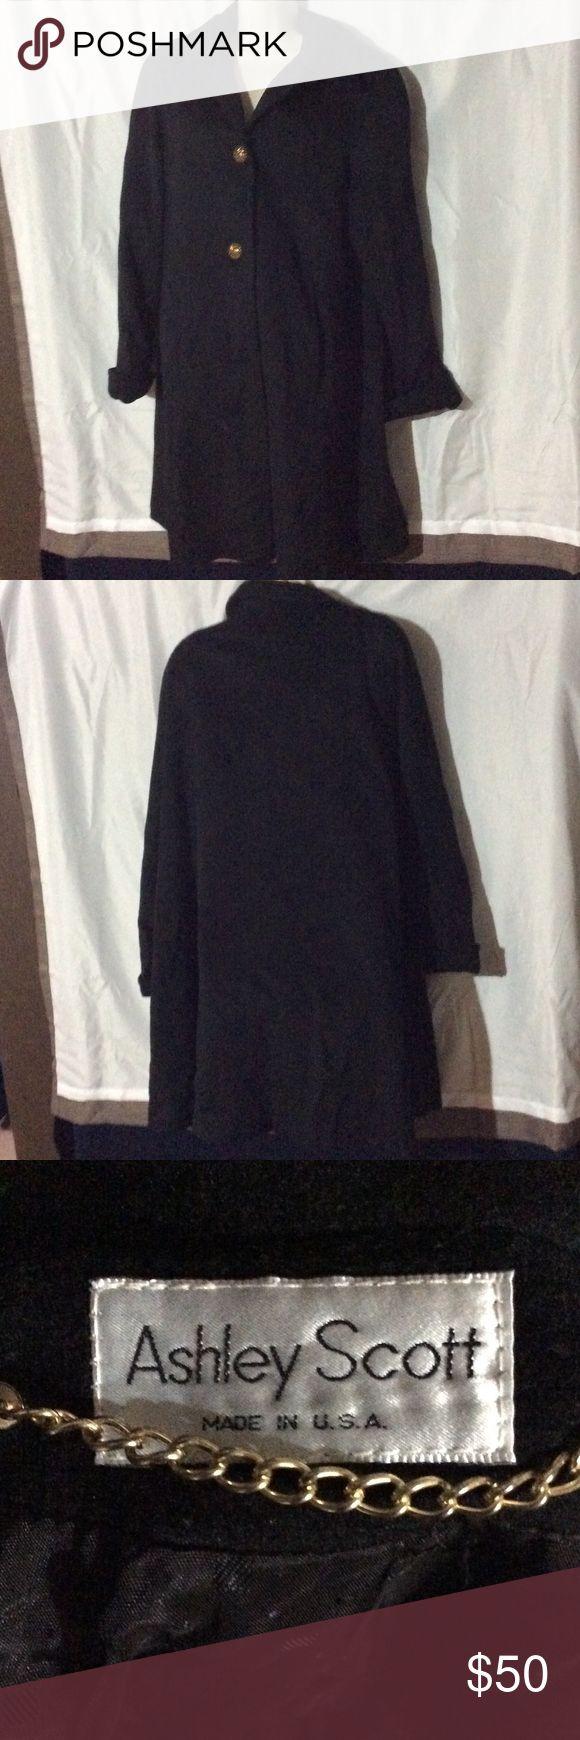 Black trench coat Black Ashley Scott trench coat. Measurements will be added. ashley scott Jackets & Coats Trench Coats